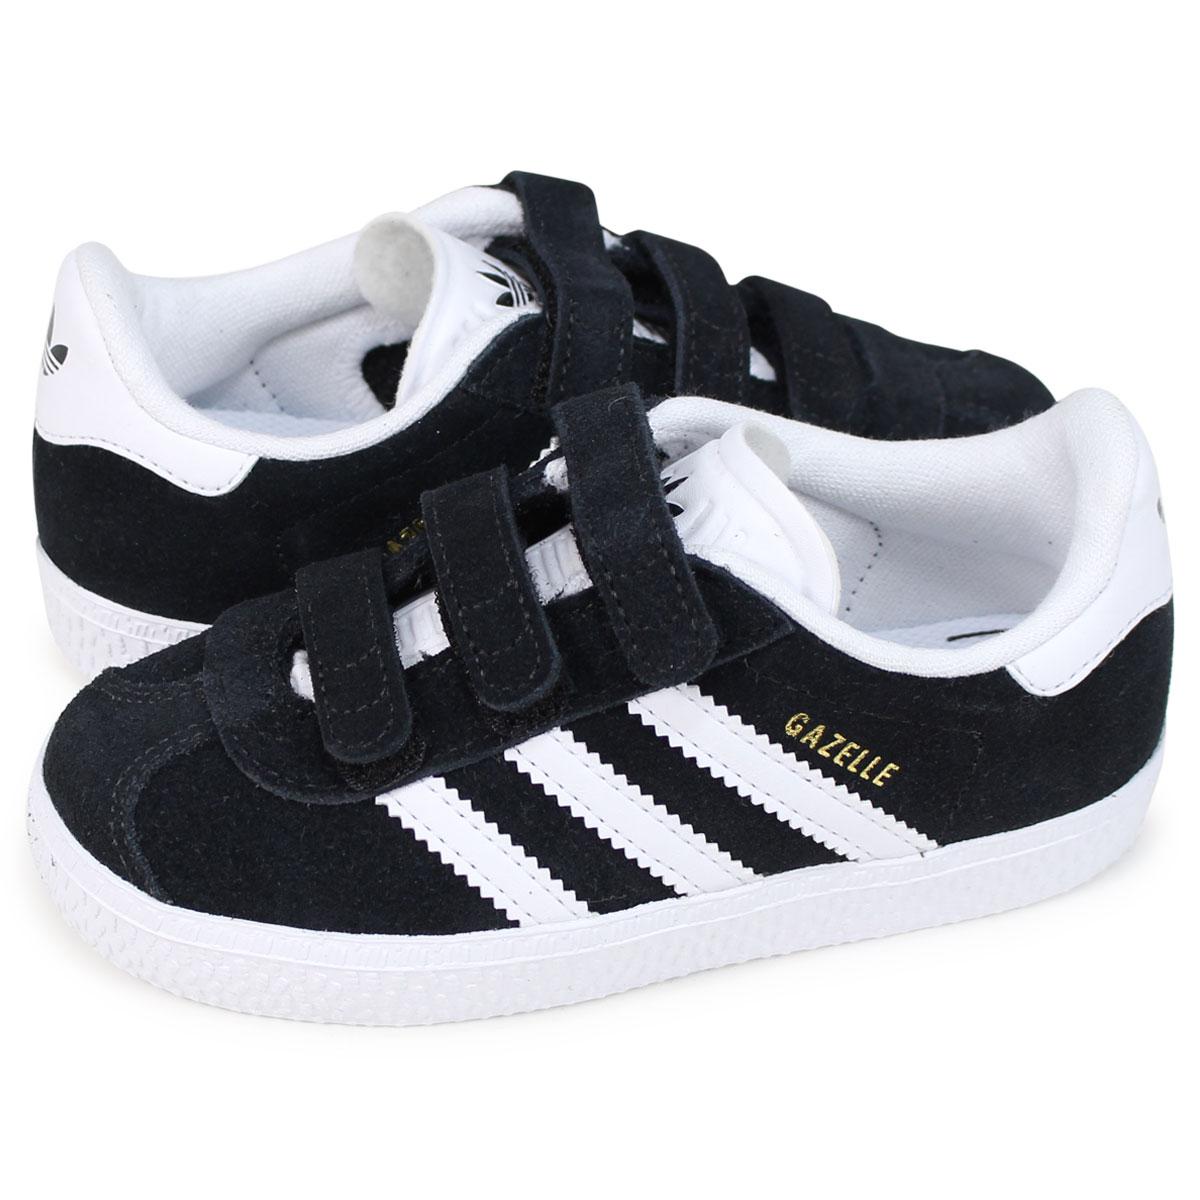 cheap for discount 81f86 5bacc adidas Originals GAZELLE CF I Adidas originals gazelle sneakers baby gut  label black black CG3139  1 25 Shinnyu load   191